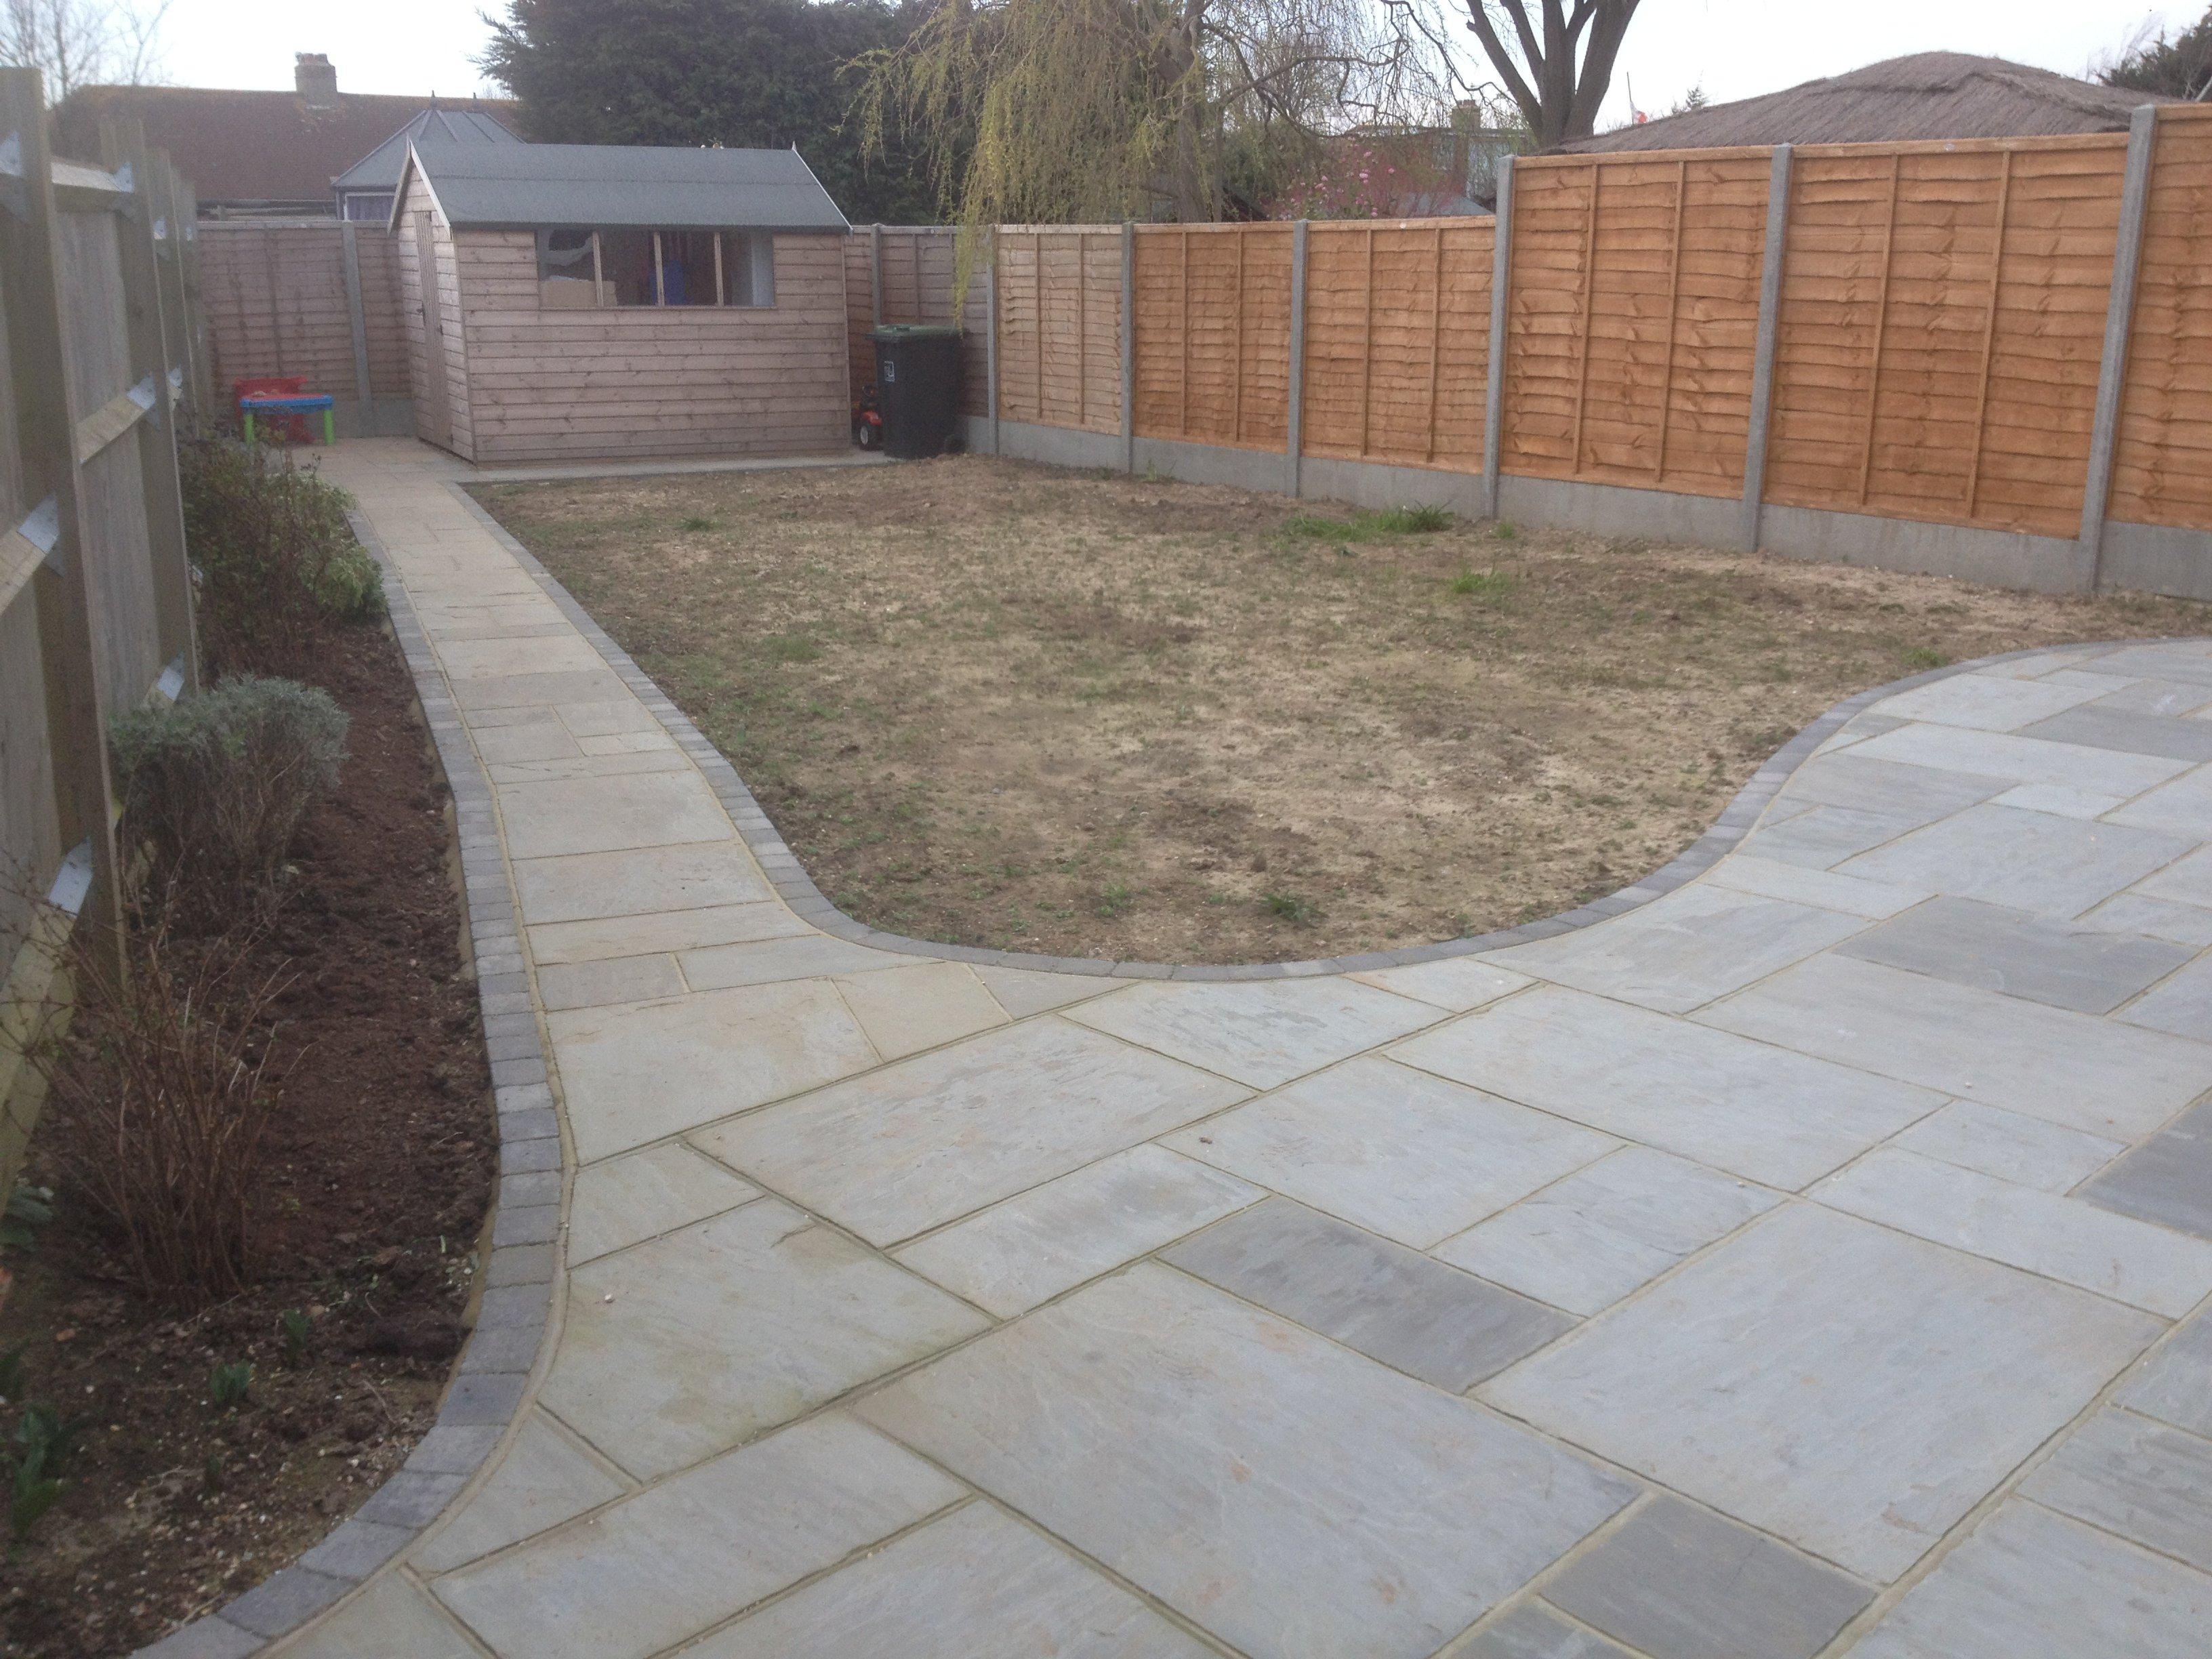 Garden pavement construction